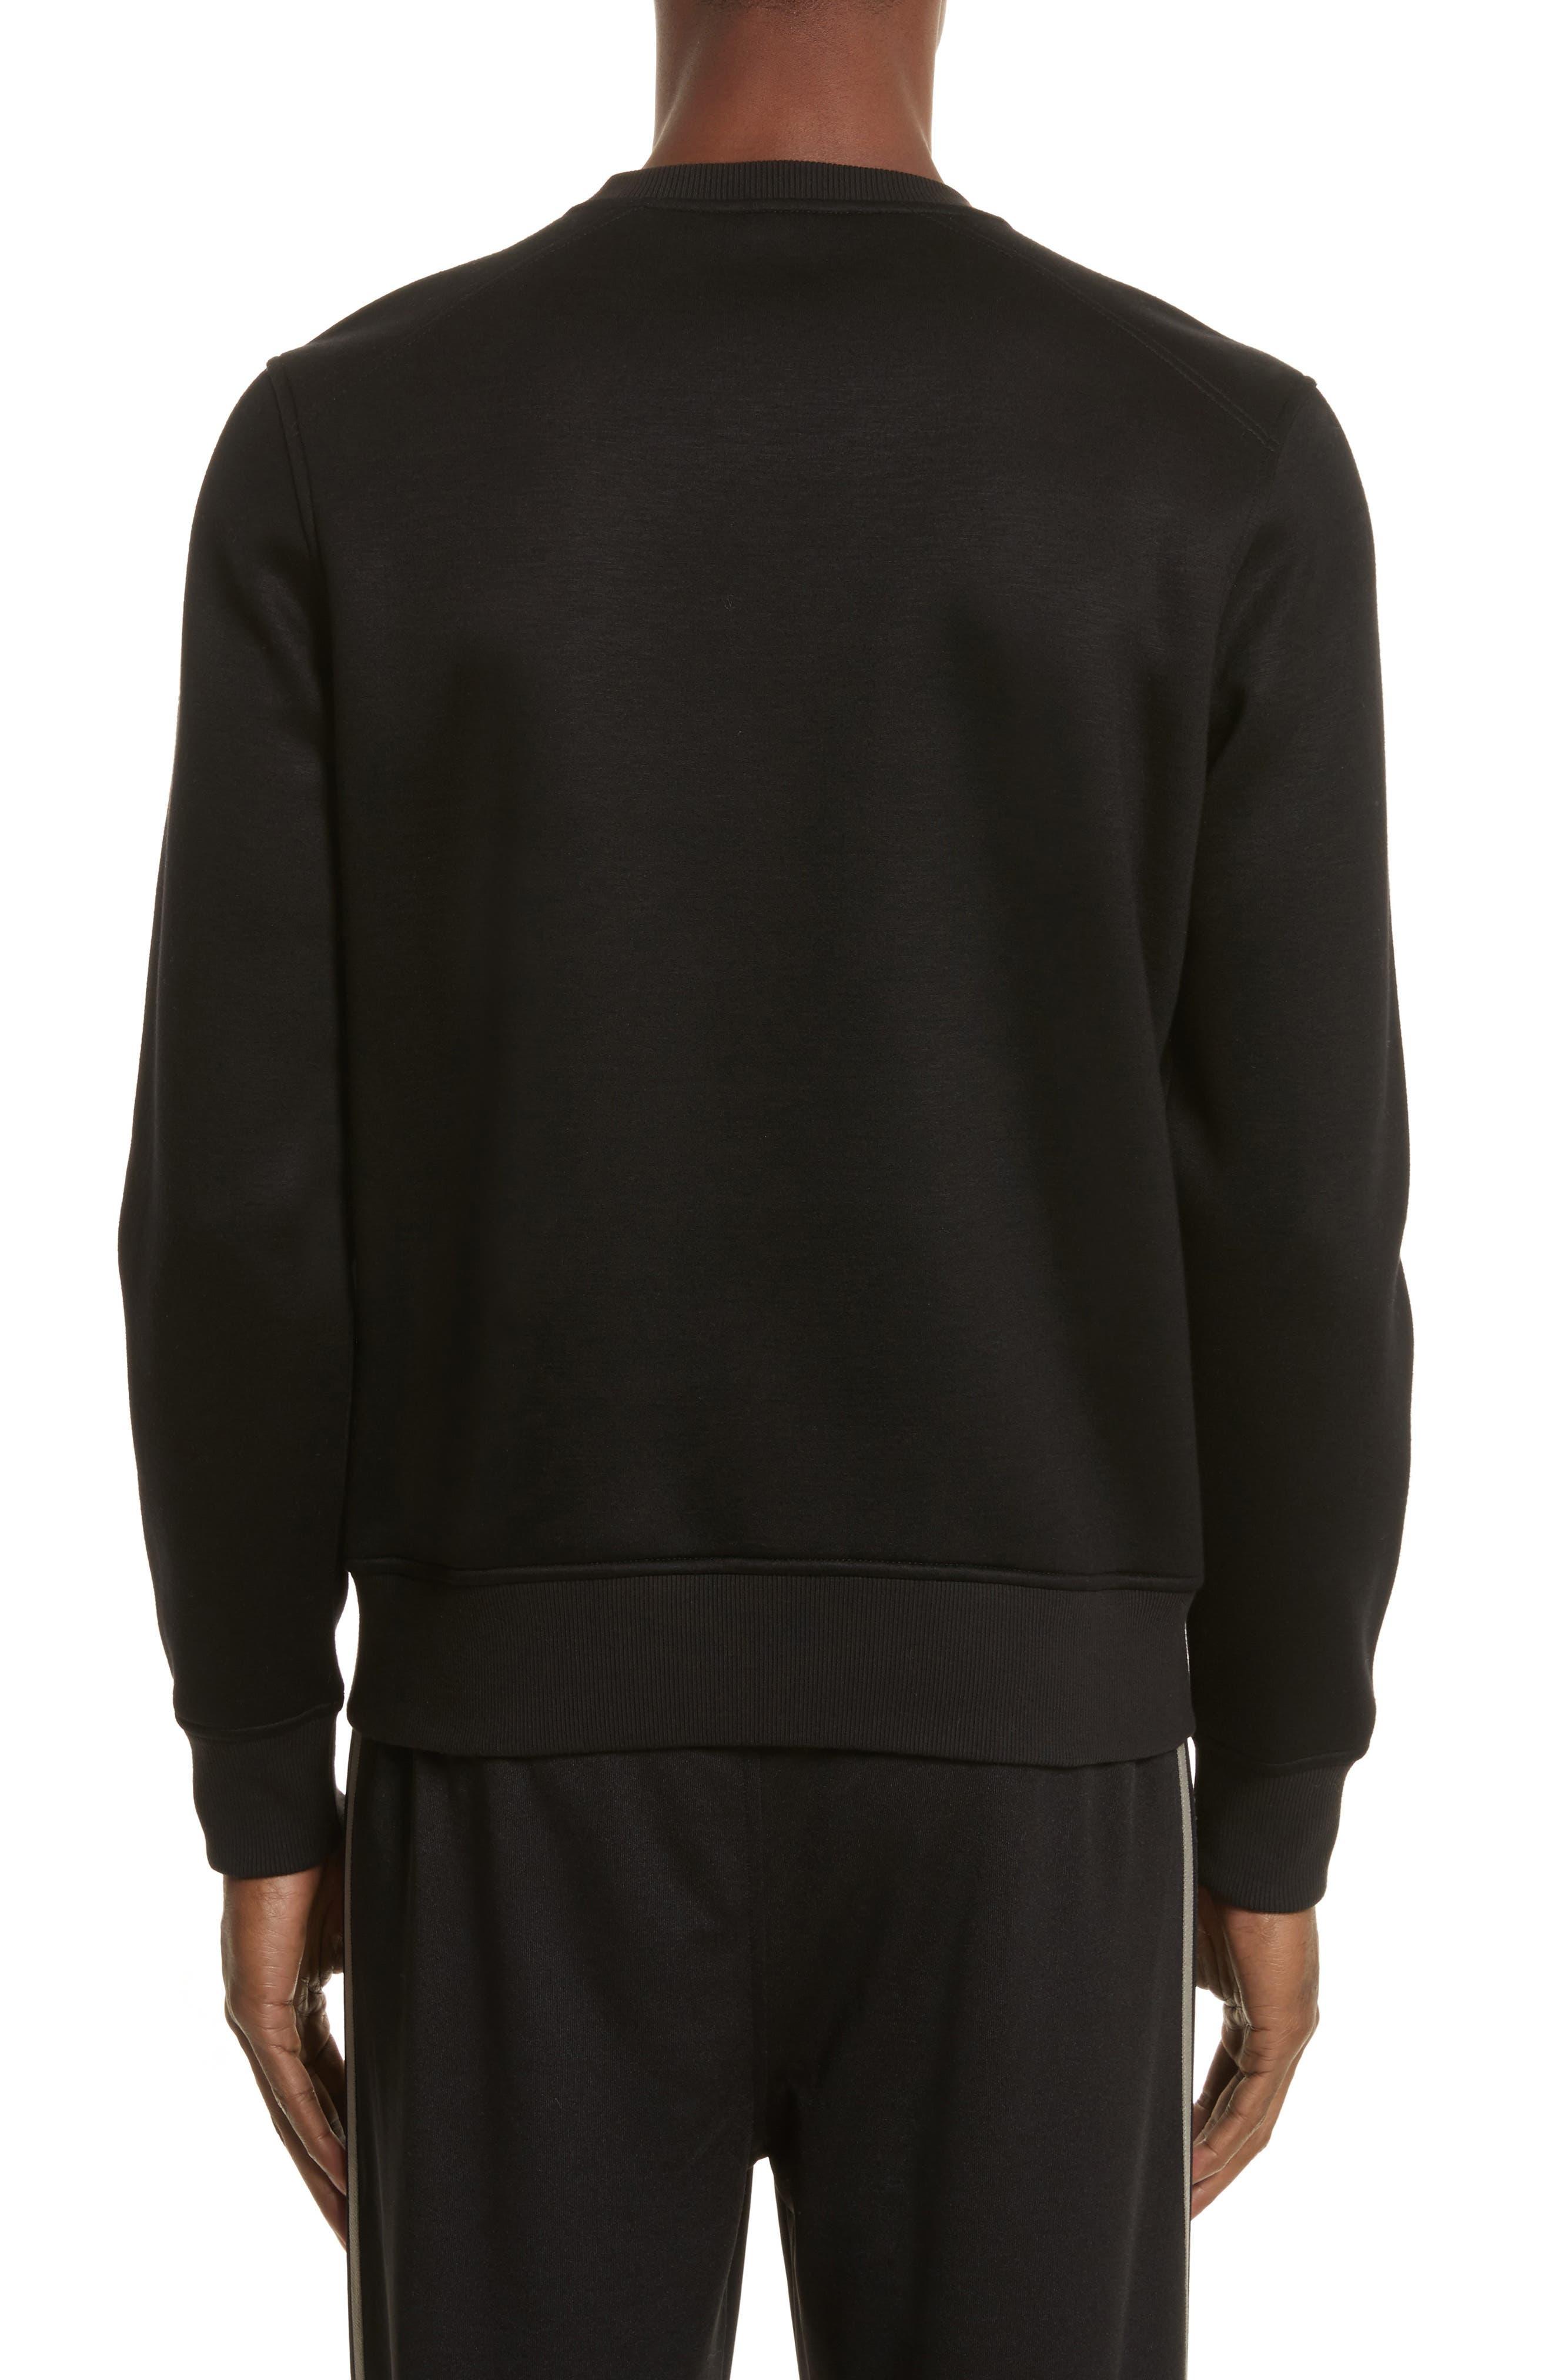 Belsford Crewneck Sweatshirt,                             Alternate thumbnail 2, color,                             Black